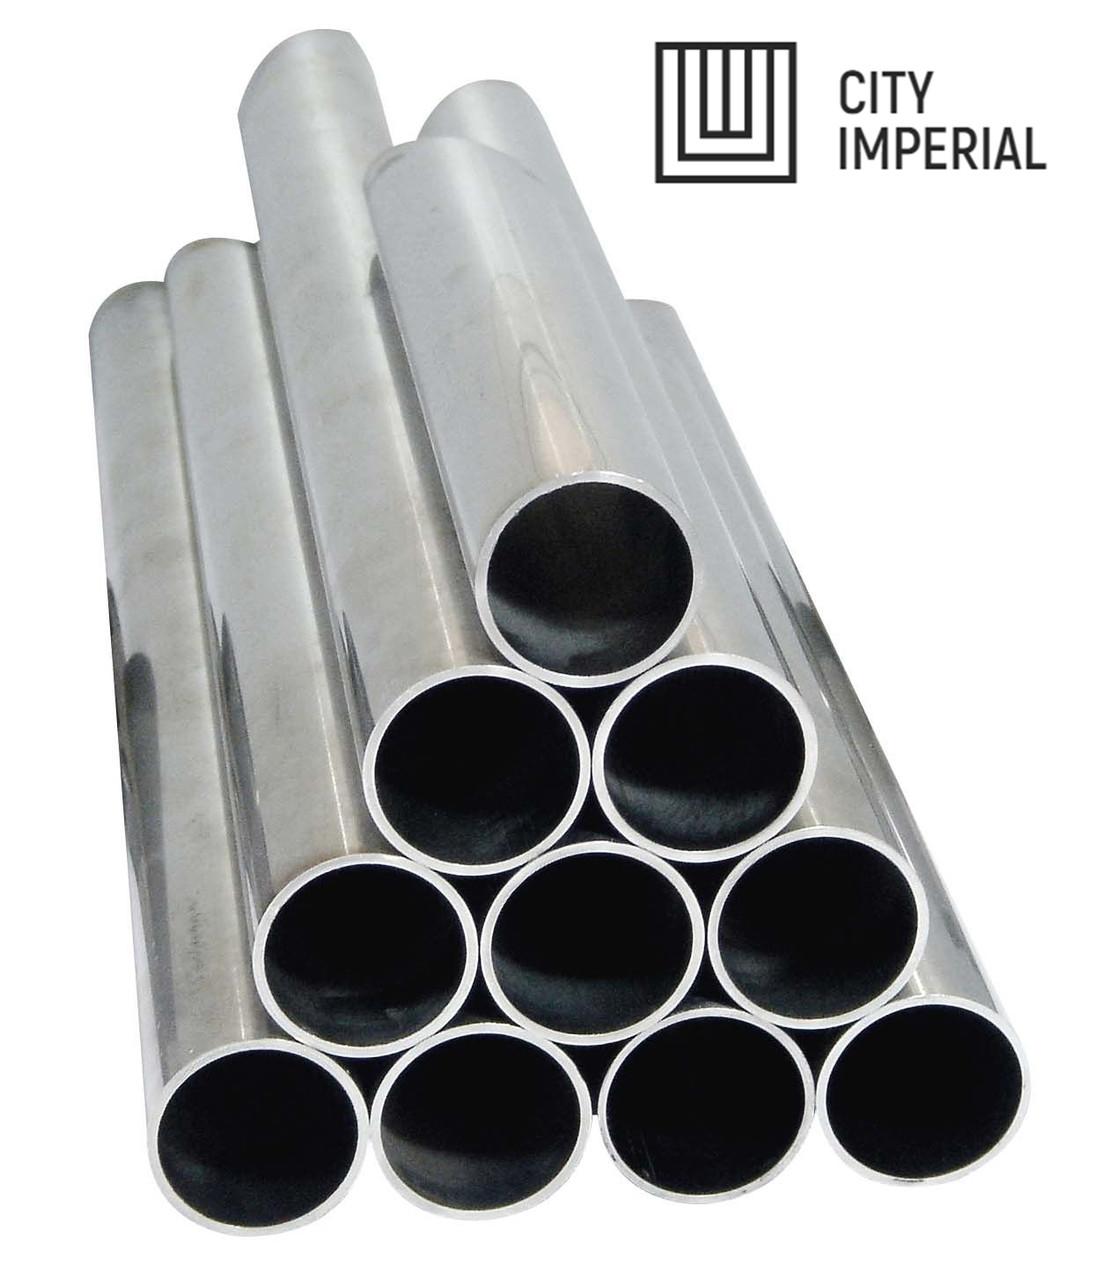 Труба 76 х 10 сталь 15Х1М1Ф